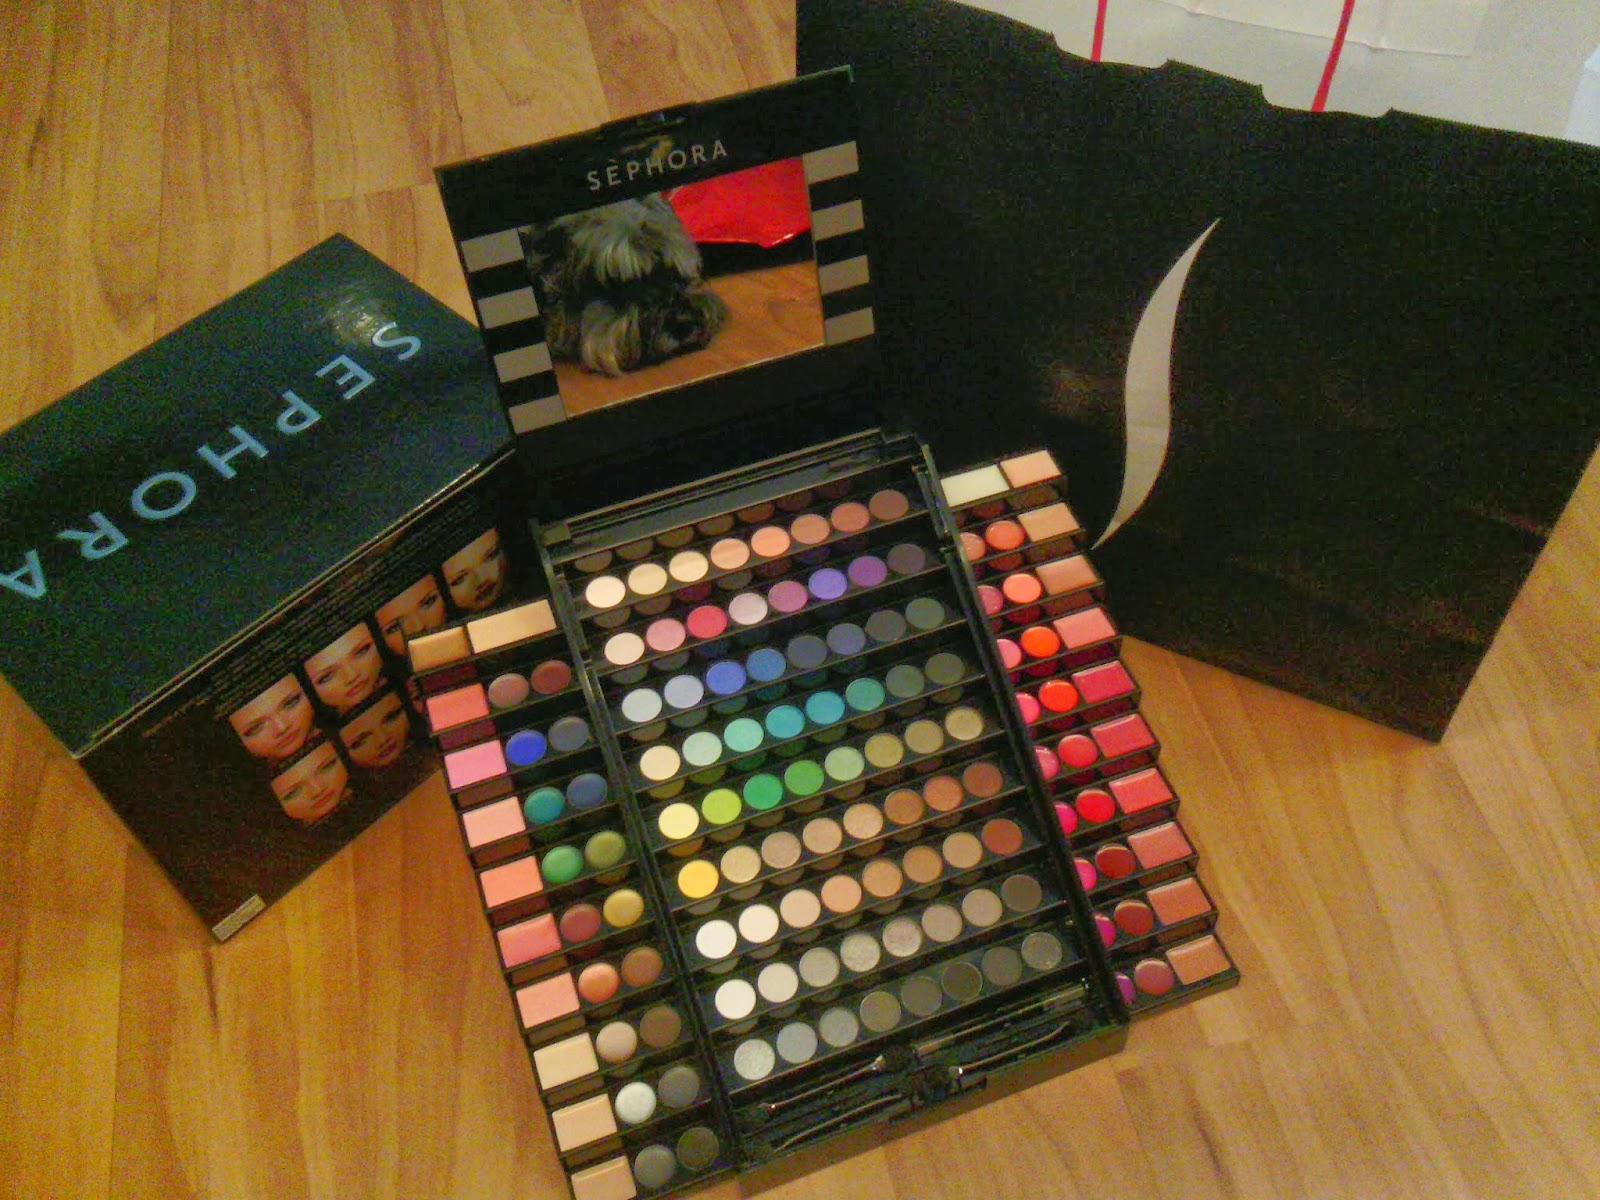 Unboxing | Sephora Makeup Academy (Blockbuster) Palette